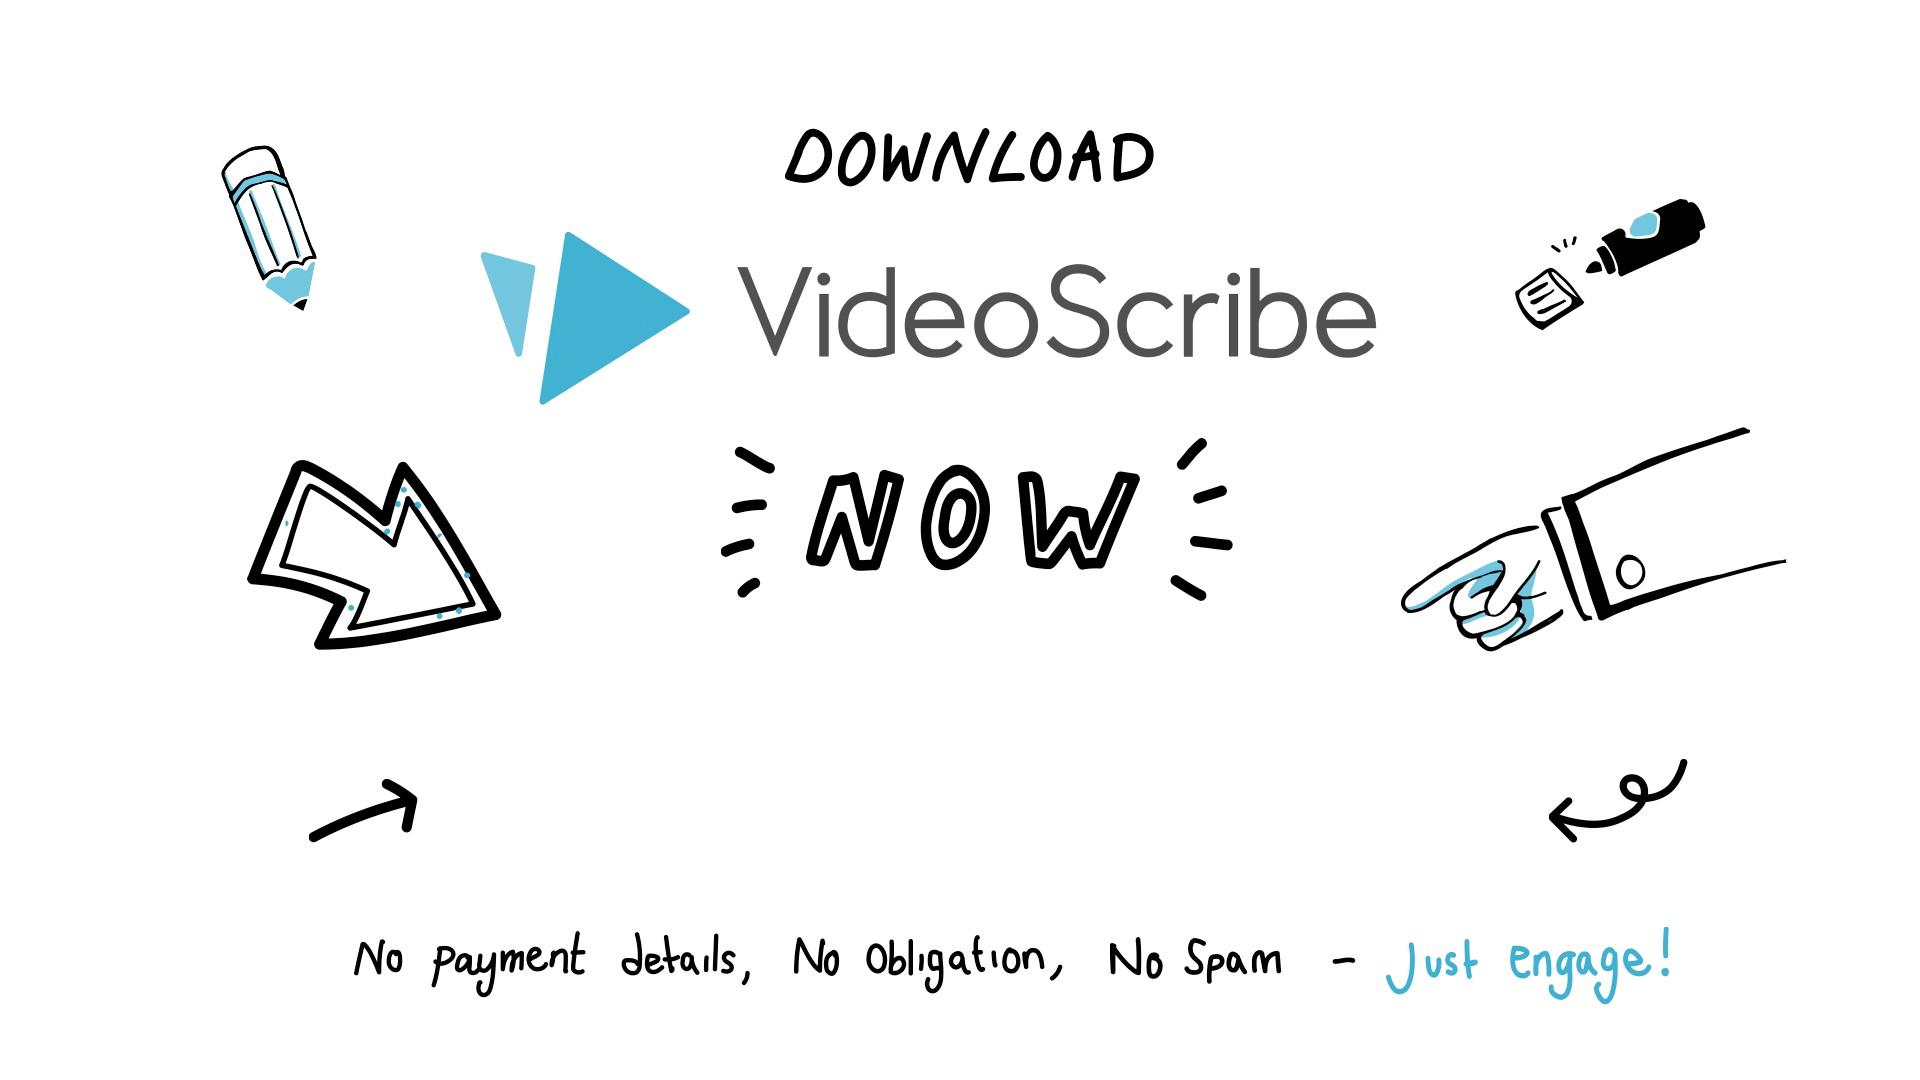 Sparkol VideoScribe The Scribing Prezi Alternative. This